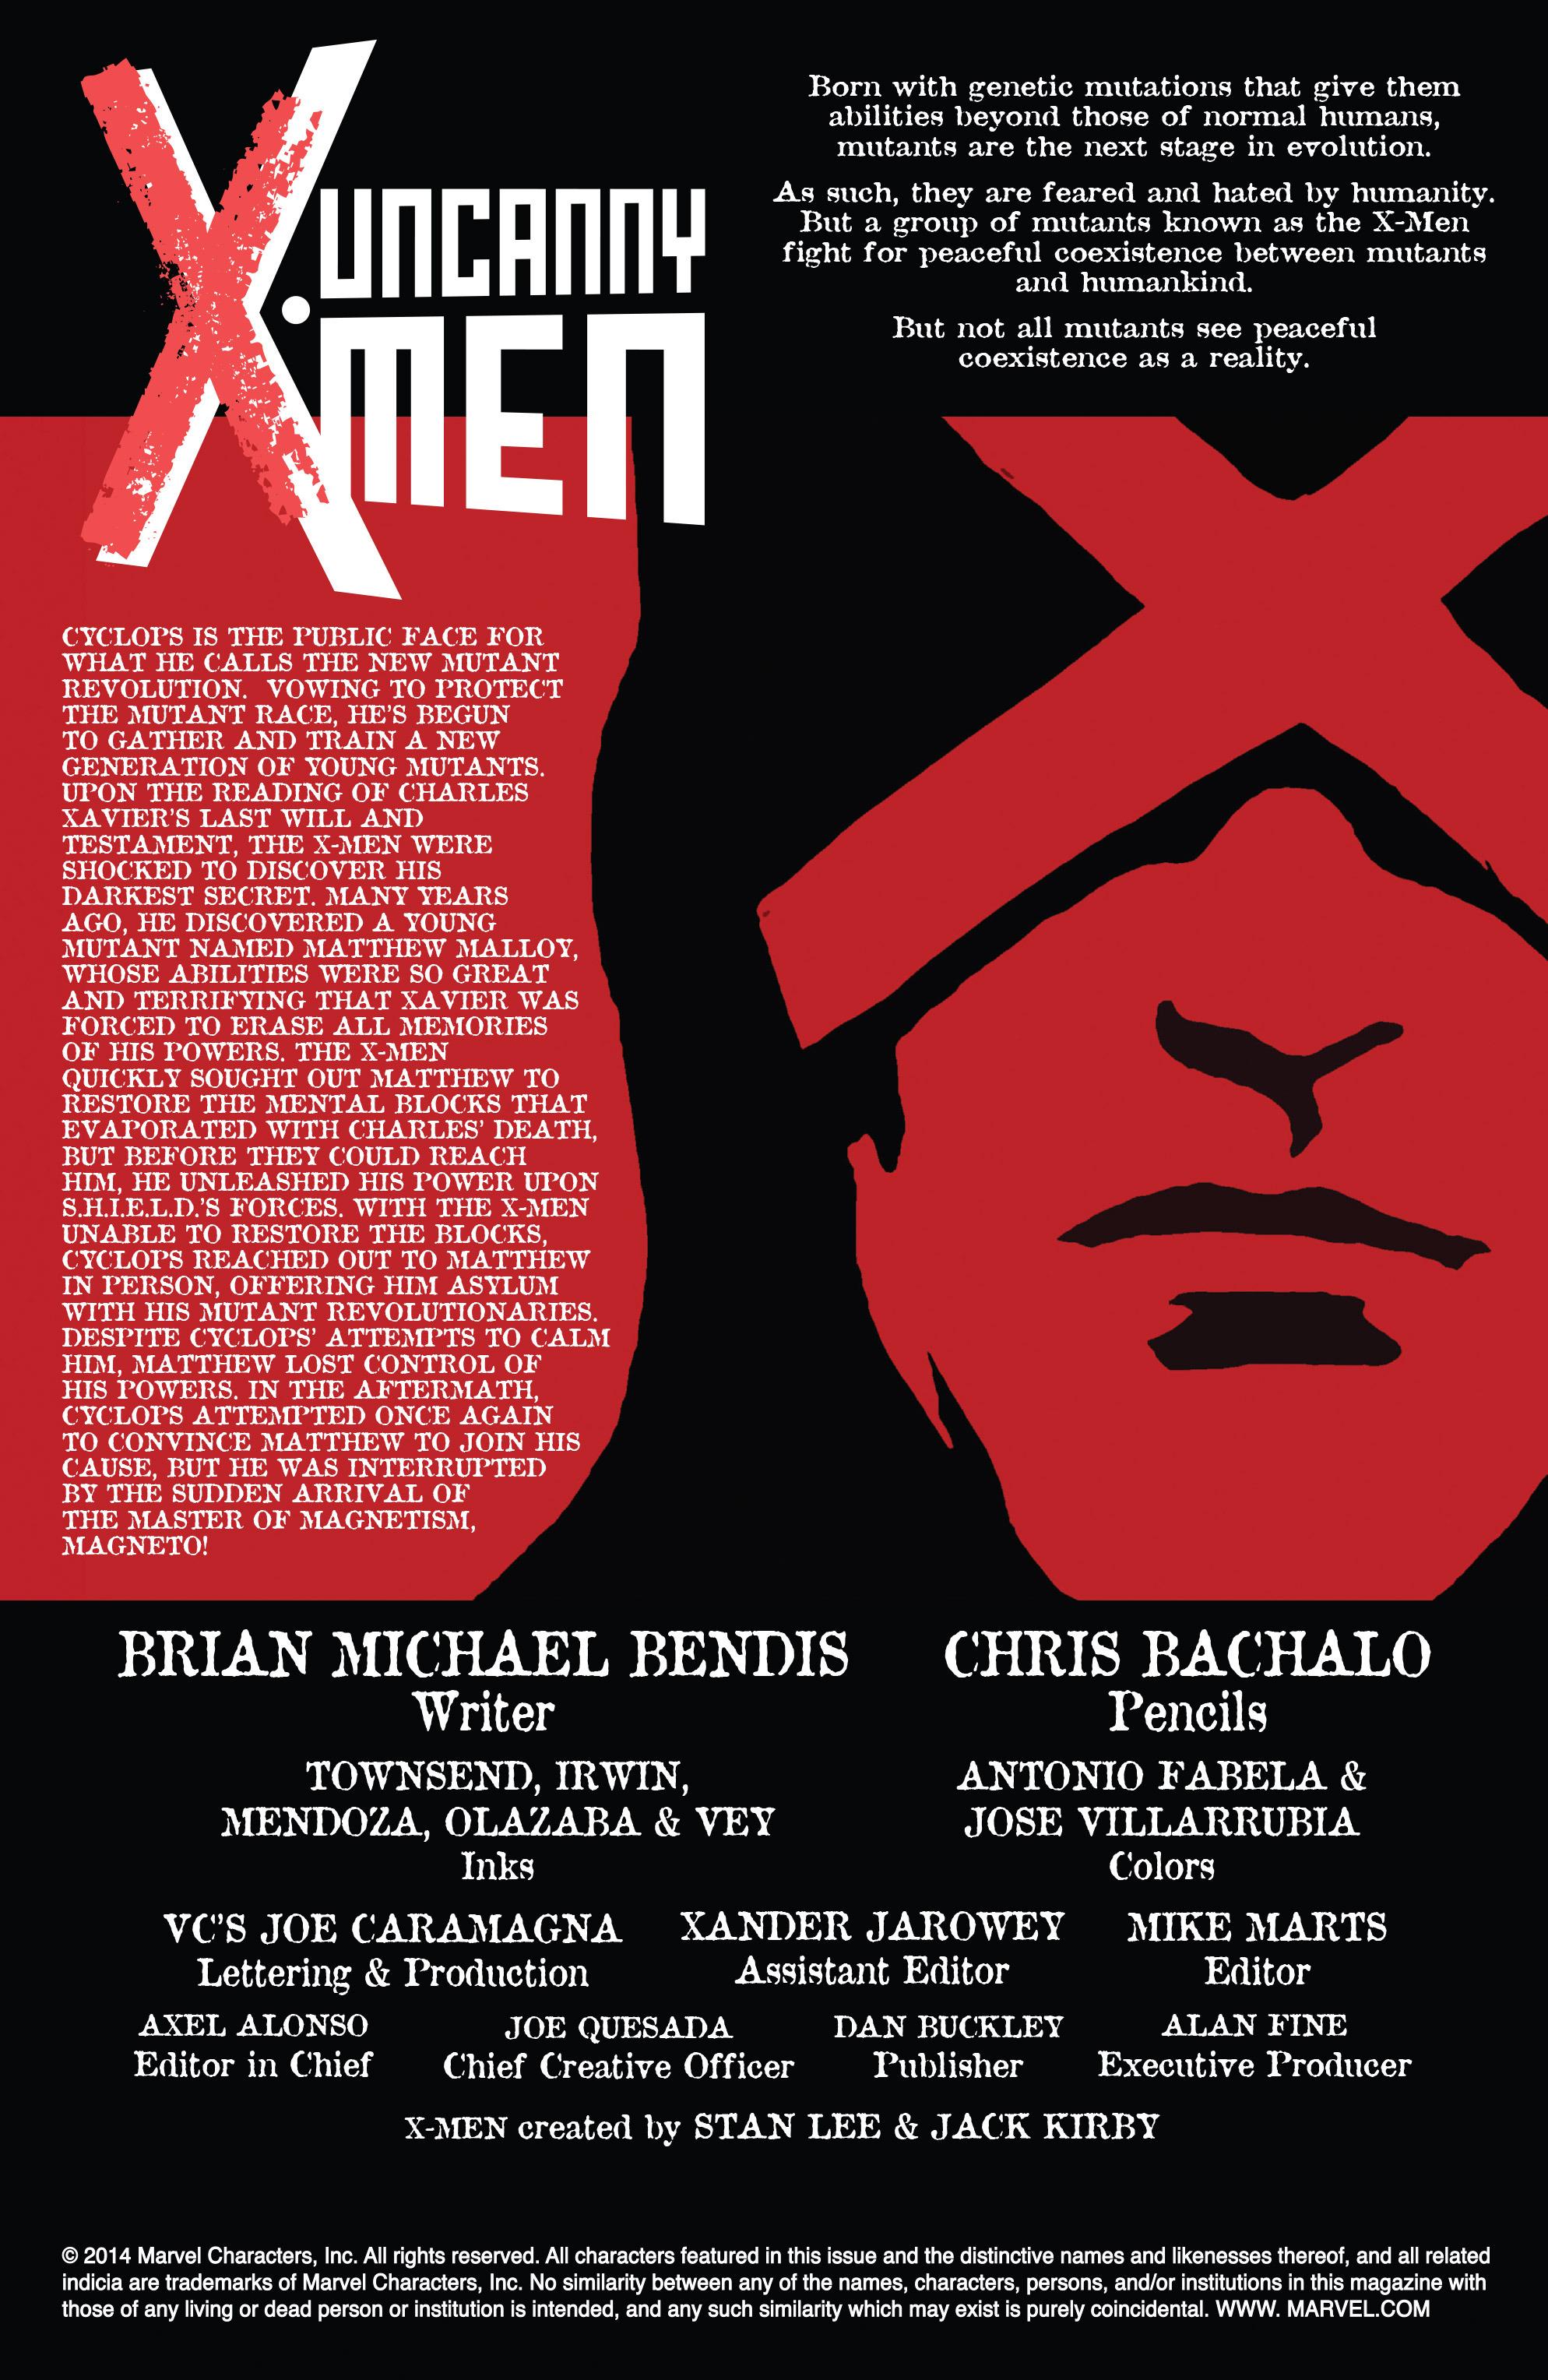 Read online Uncanny X-Men (2013) comic -  Issue # _TPB 5 - The Omega Mutant - 57